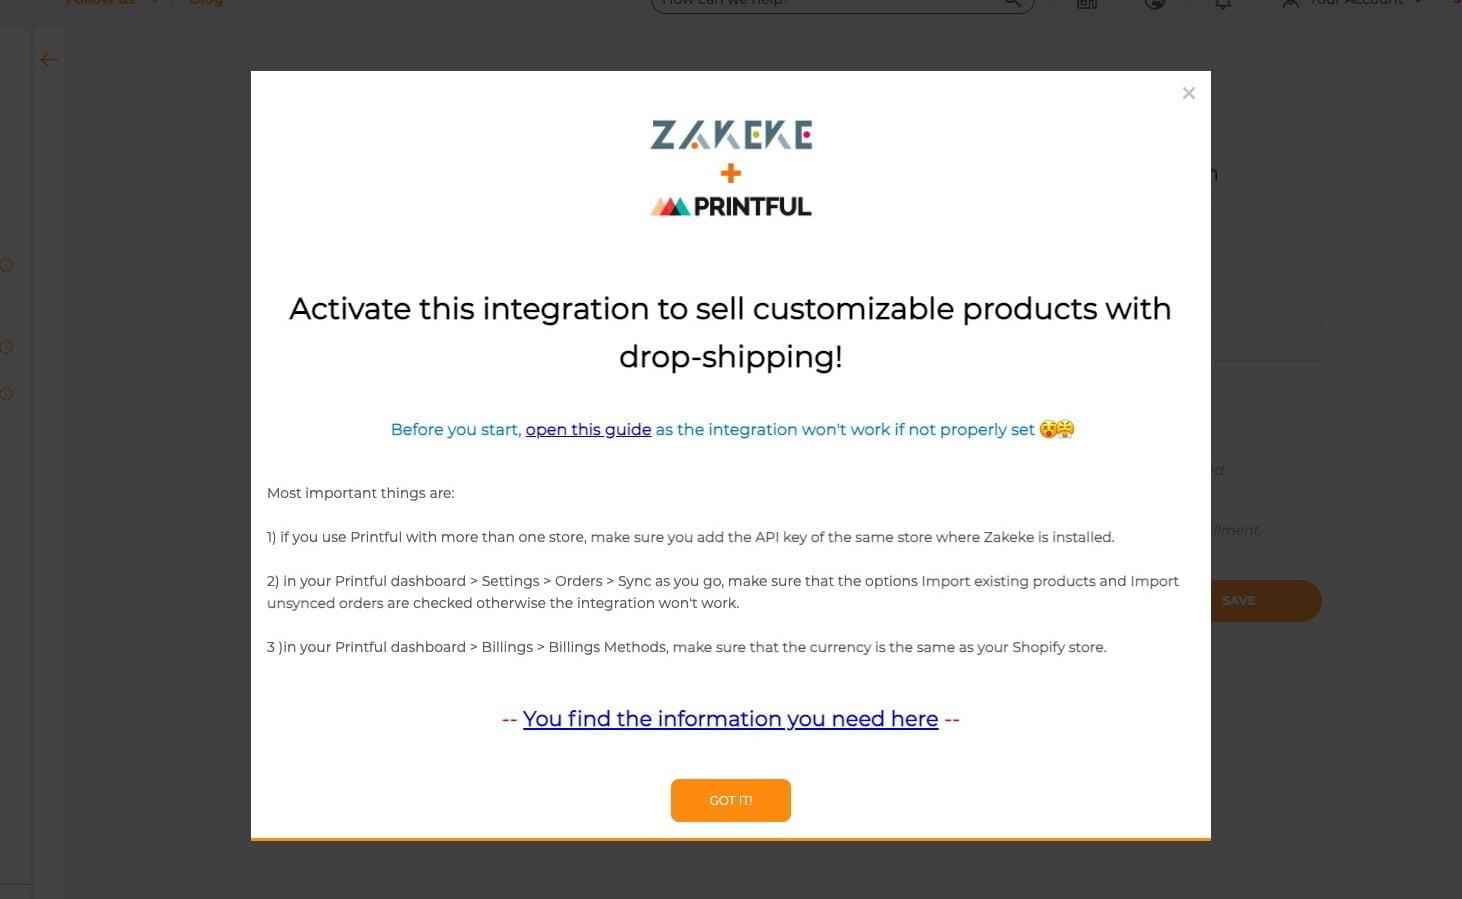 zakeke customer success story 5